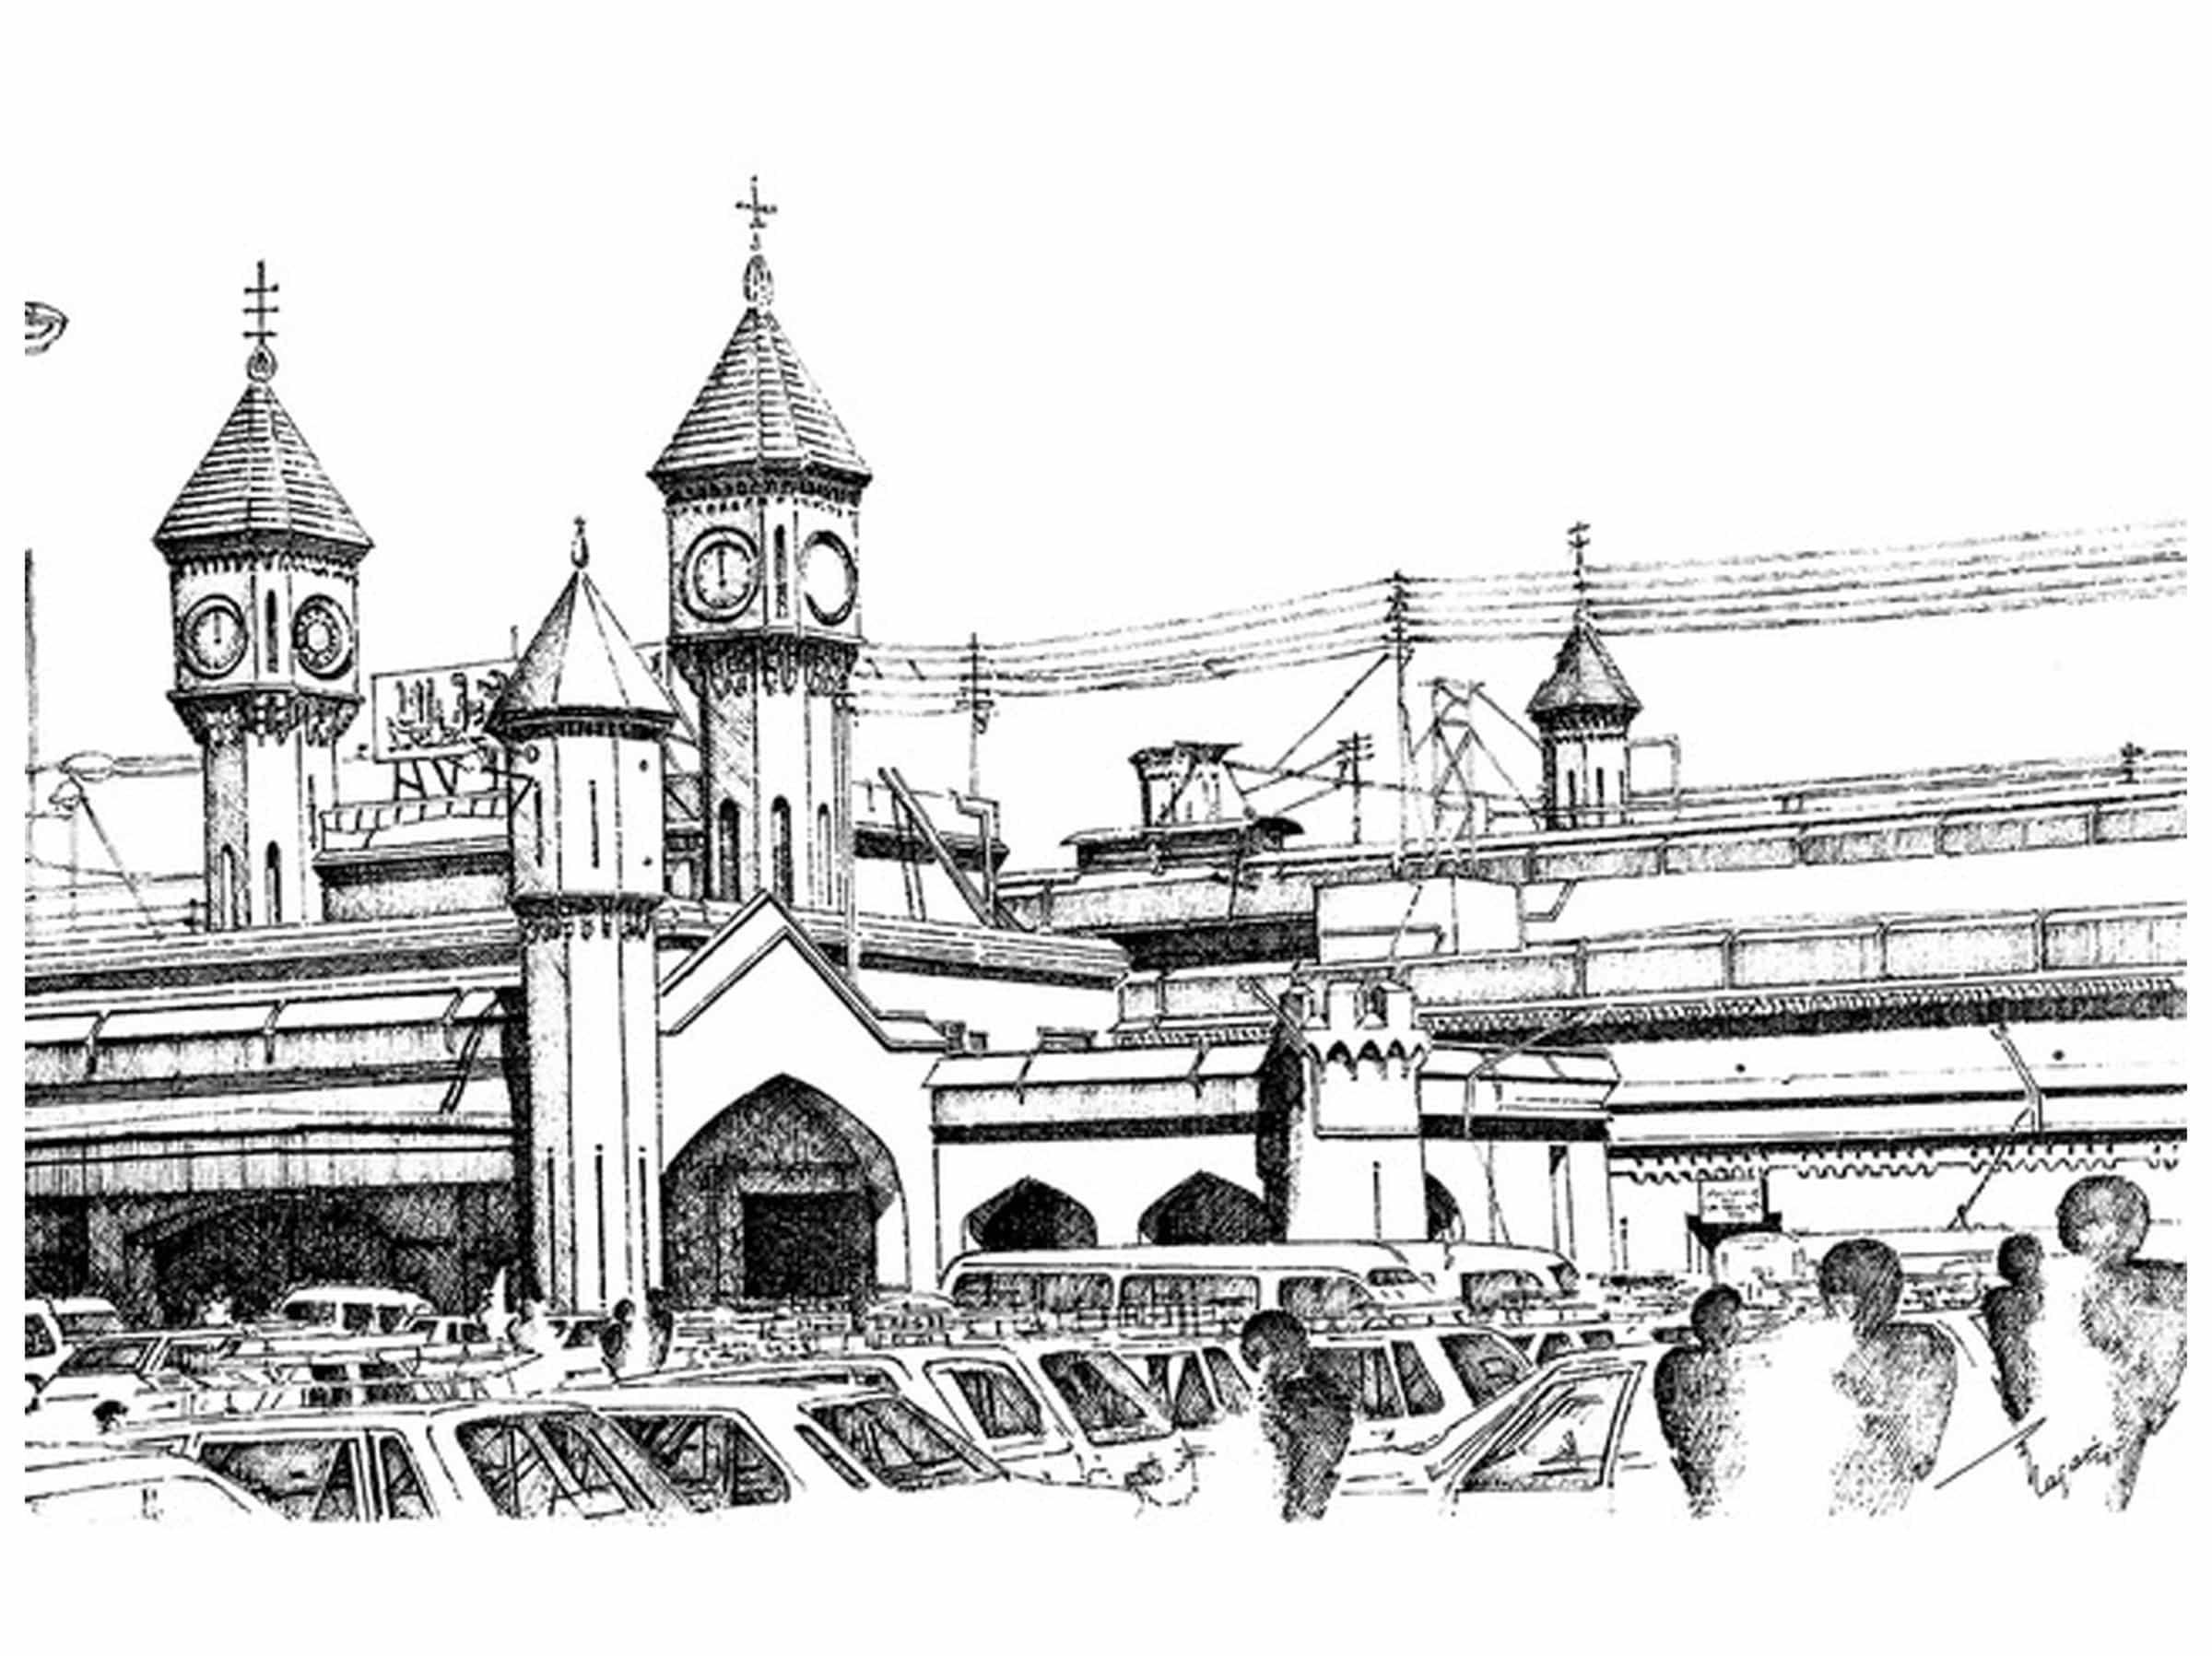 Railway Station, Lahore, PAKISTAN - Drawings by Zehra Naqavi